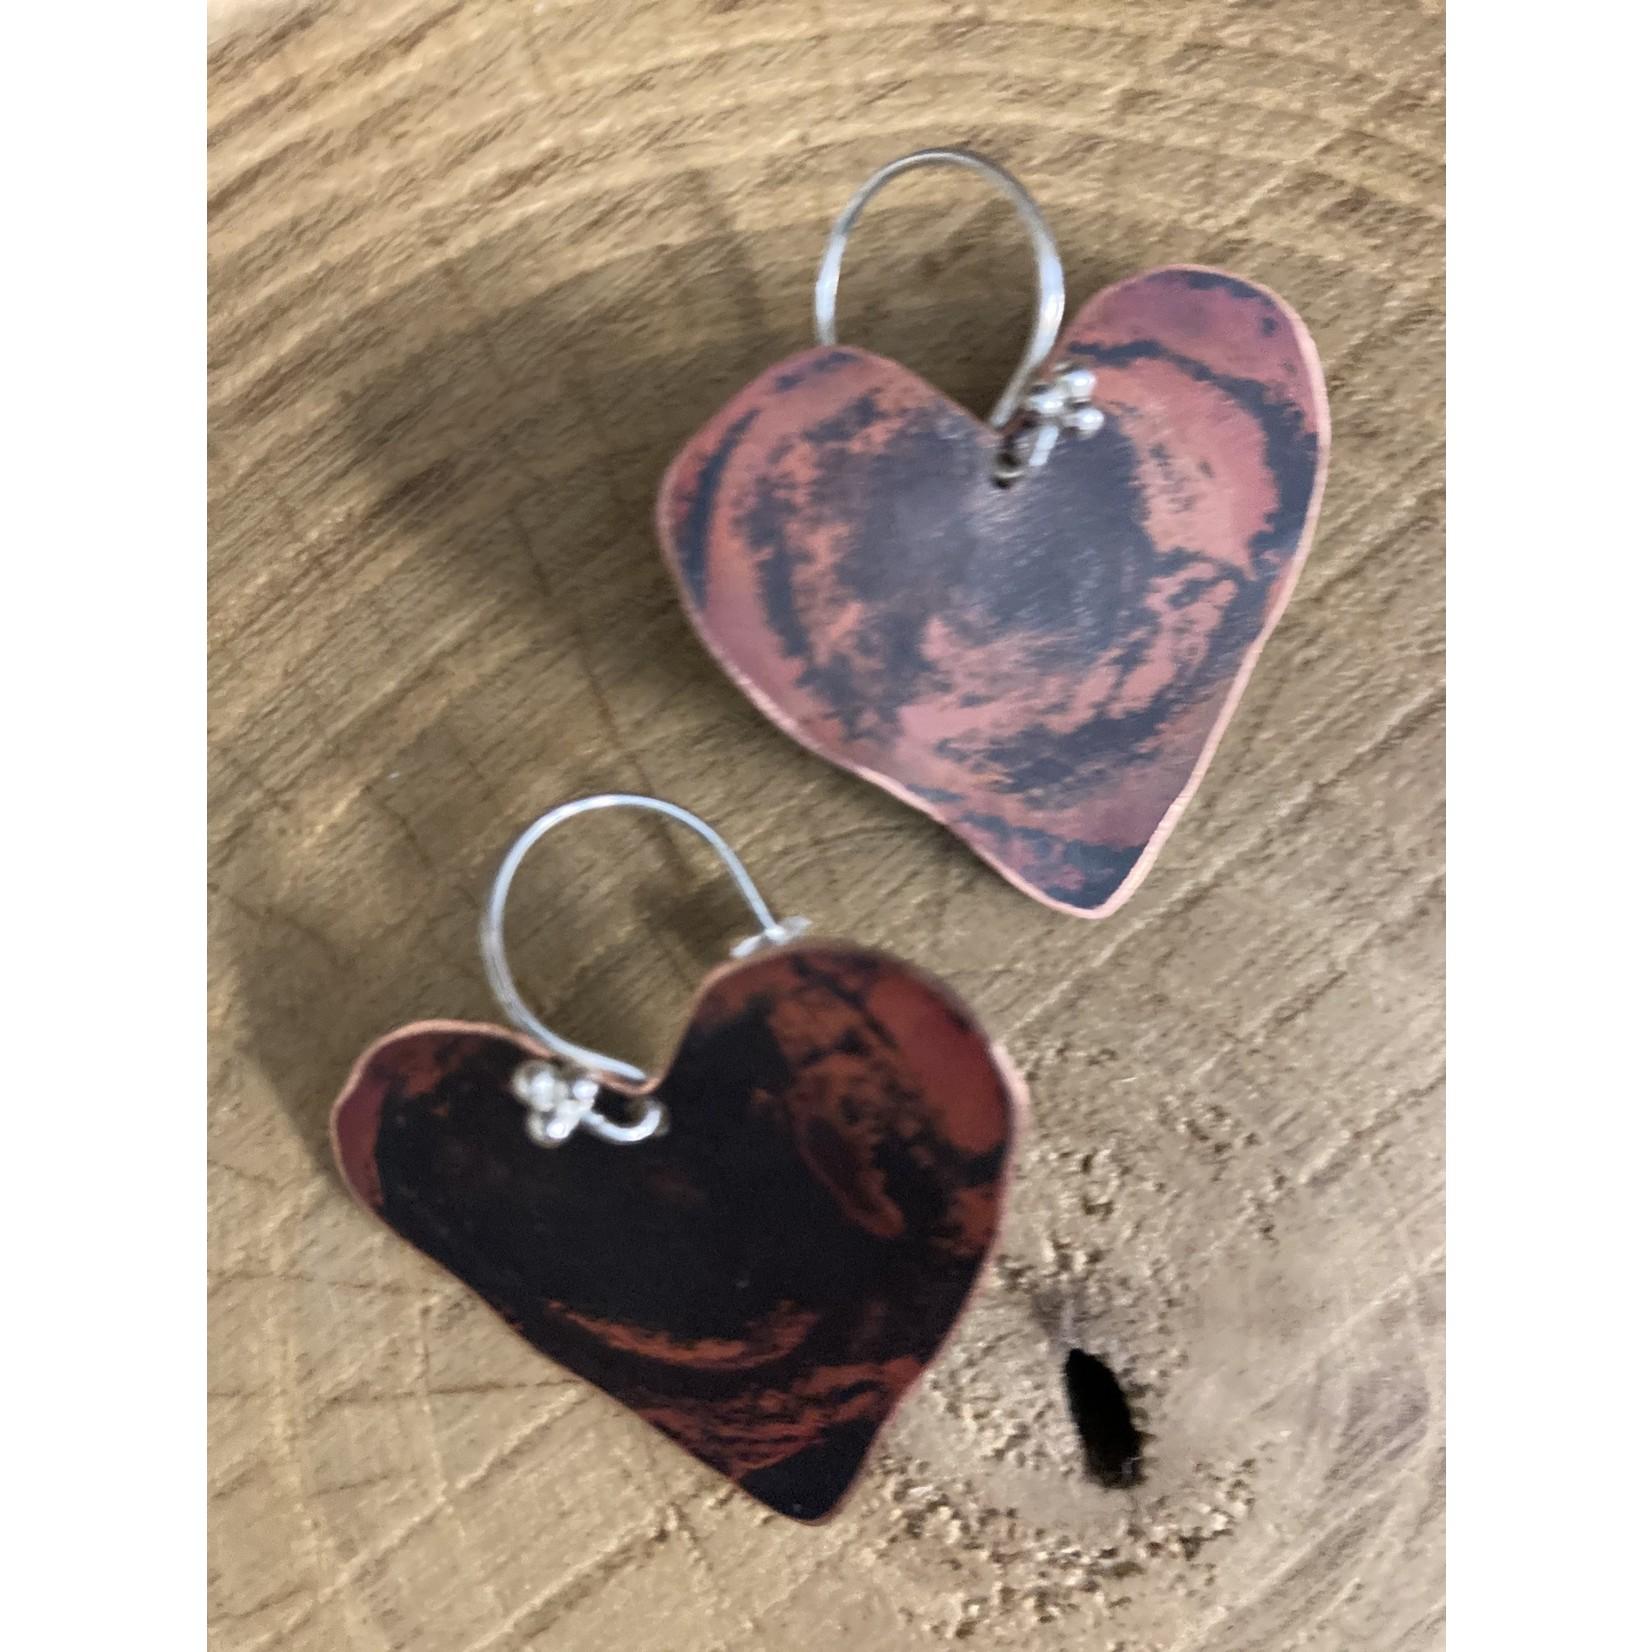 Wendy Todd Wendy Todd #293 medium copper heart earrings on sterling earwire